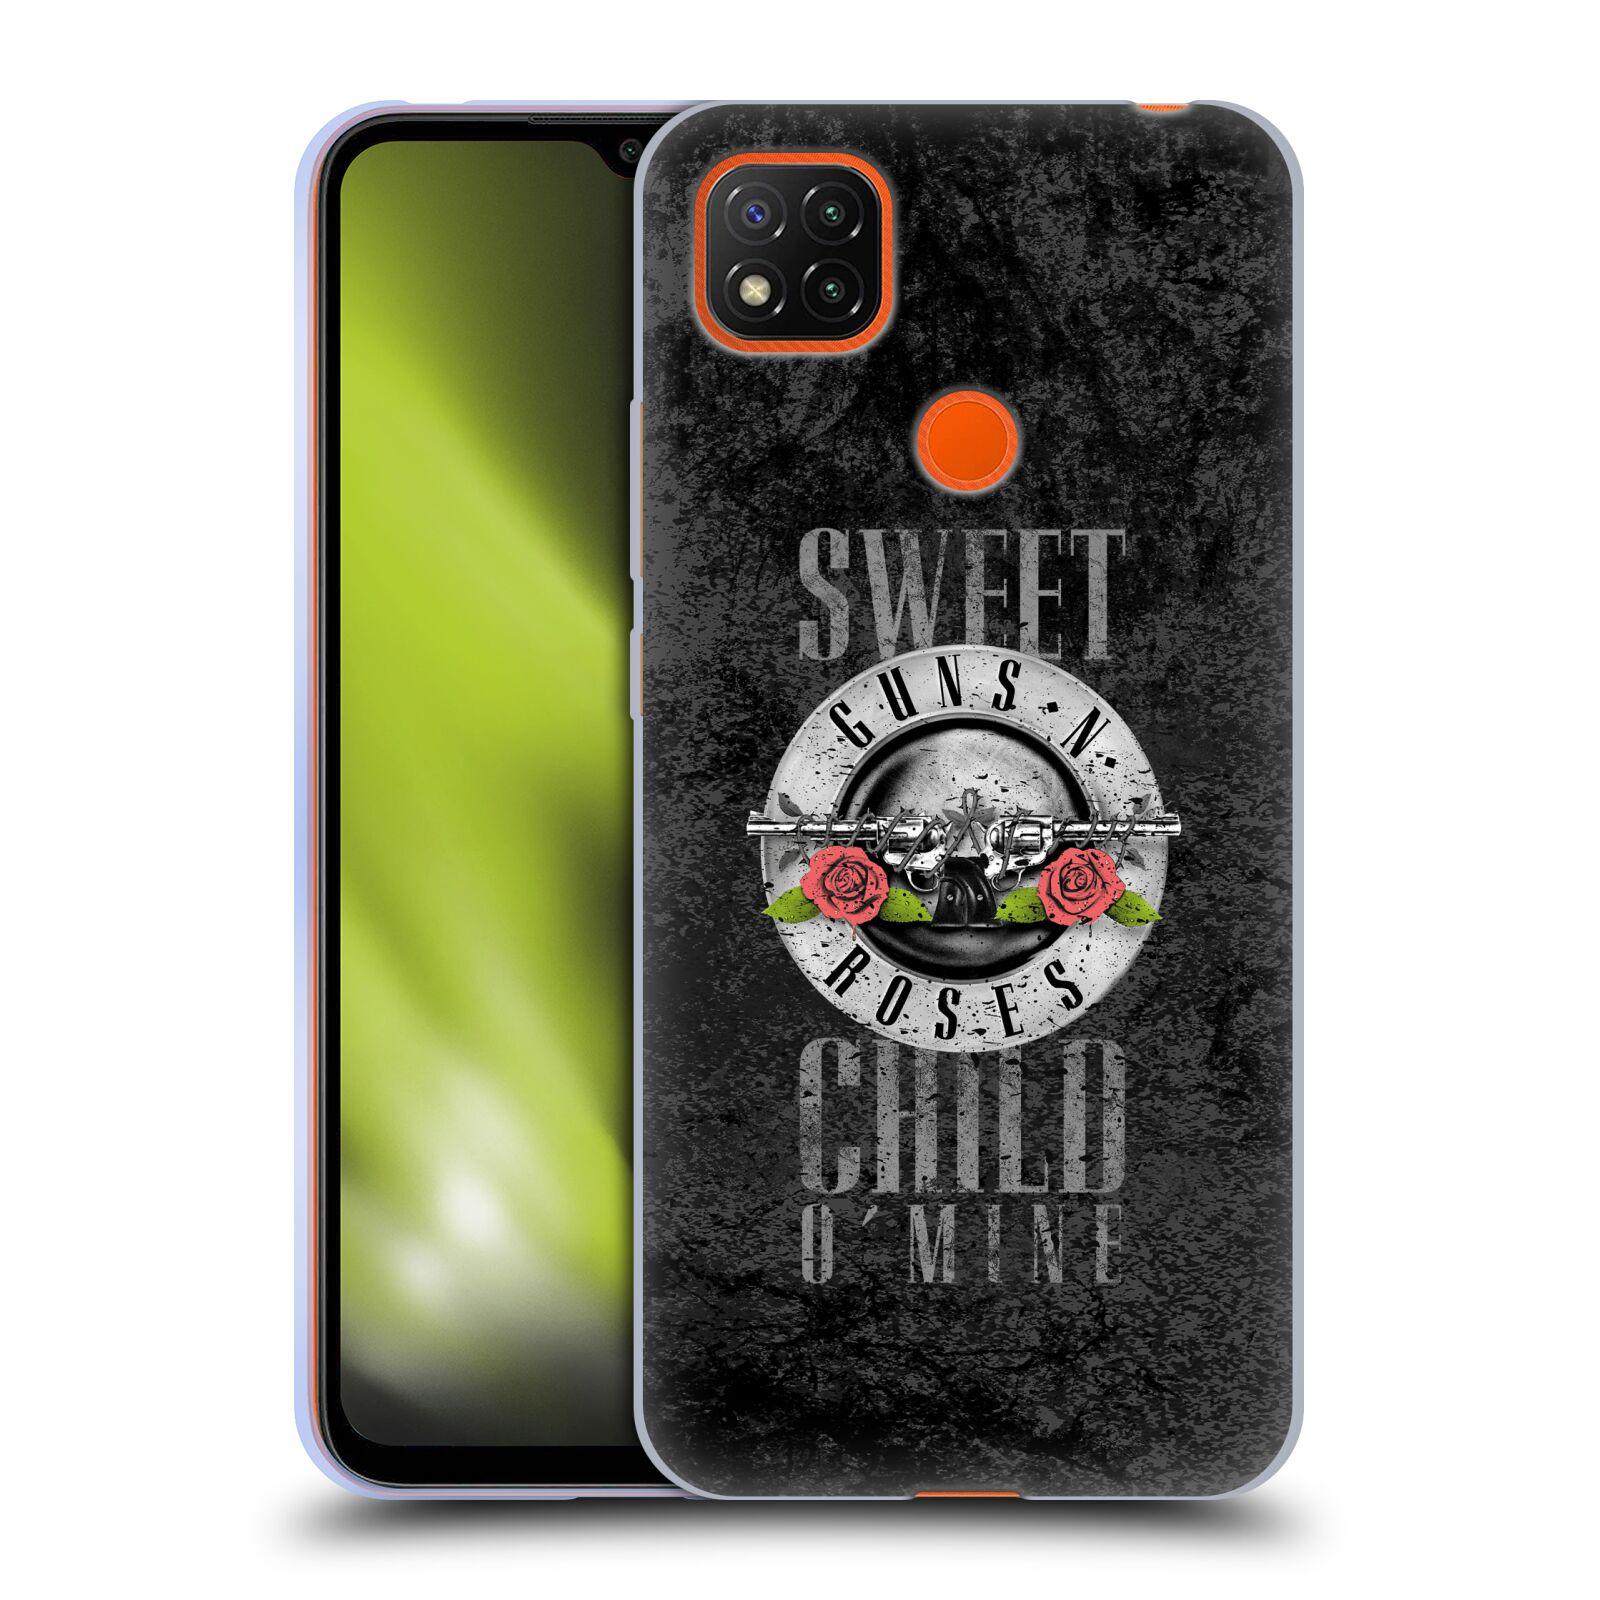 Silikonové pouzdro na mobil Xiaomi Redmi 9C - Head Case - Guns N' Roses - Sweet Child